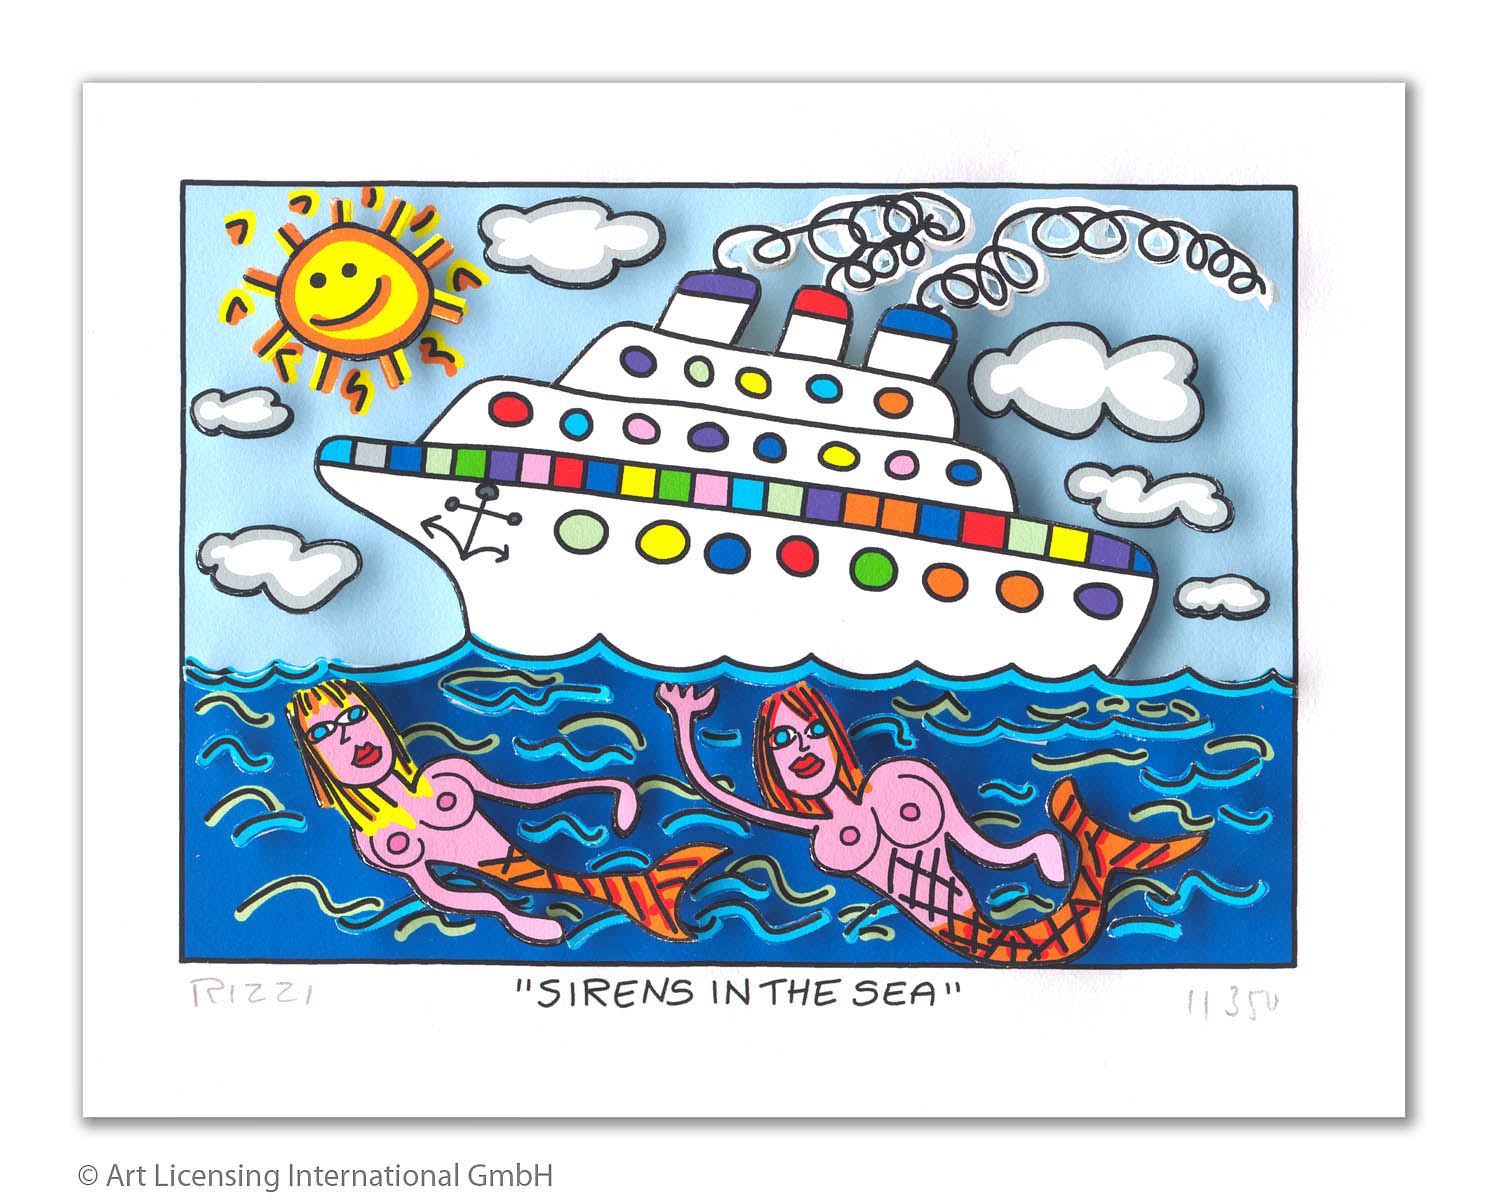 James Rizzi - Sirens in the Sea